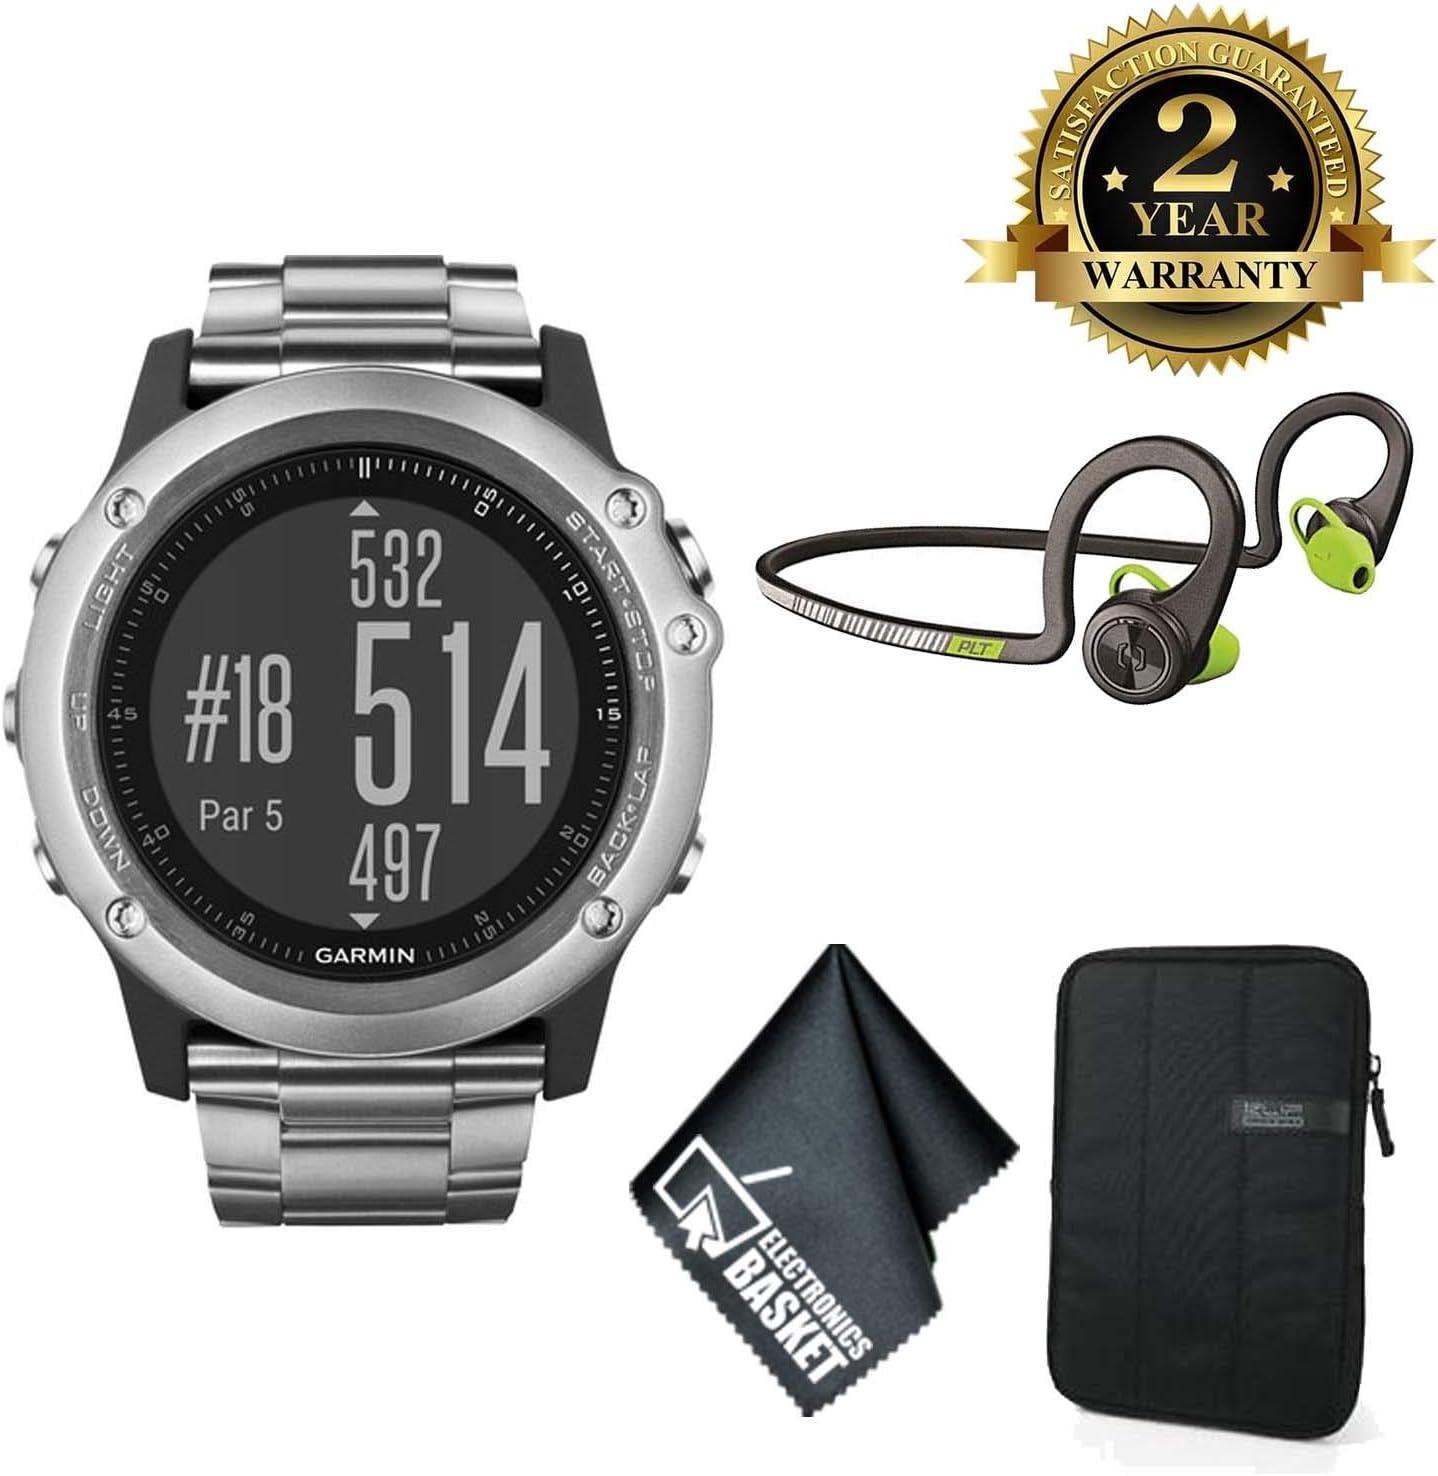 Garmin Fenix 3 サファイア マルチスポーツ トレーニング GPSウォッチ (チタンバンド付きチタン) ベーシックアクセサリーセット  Basic